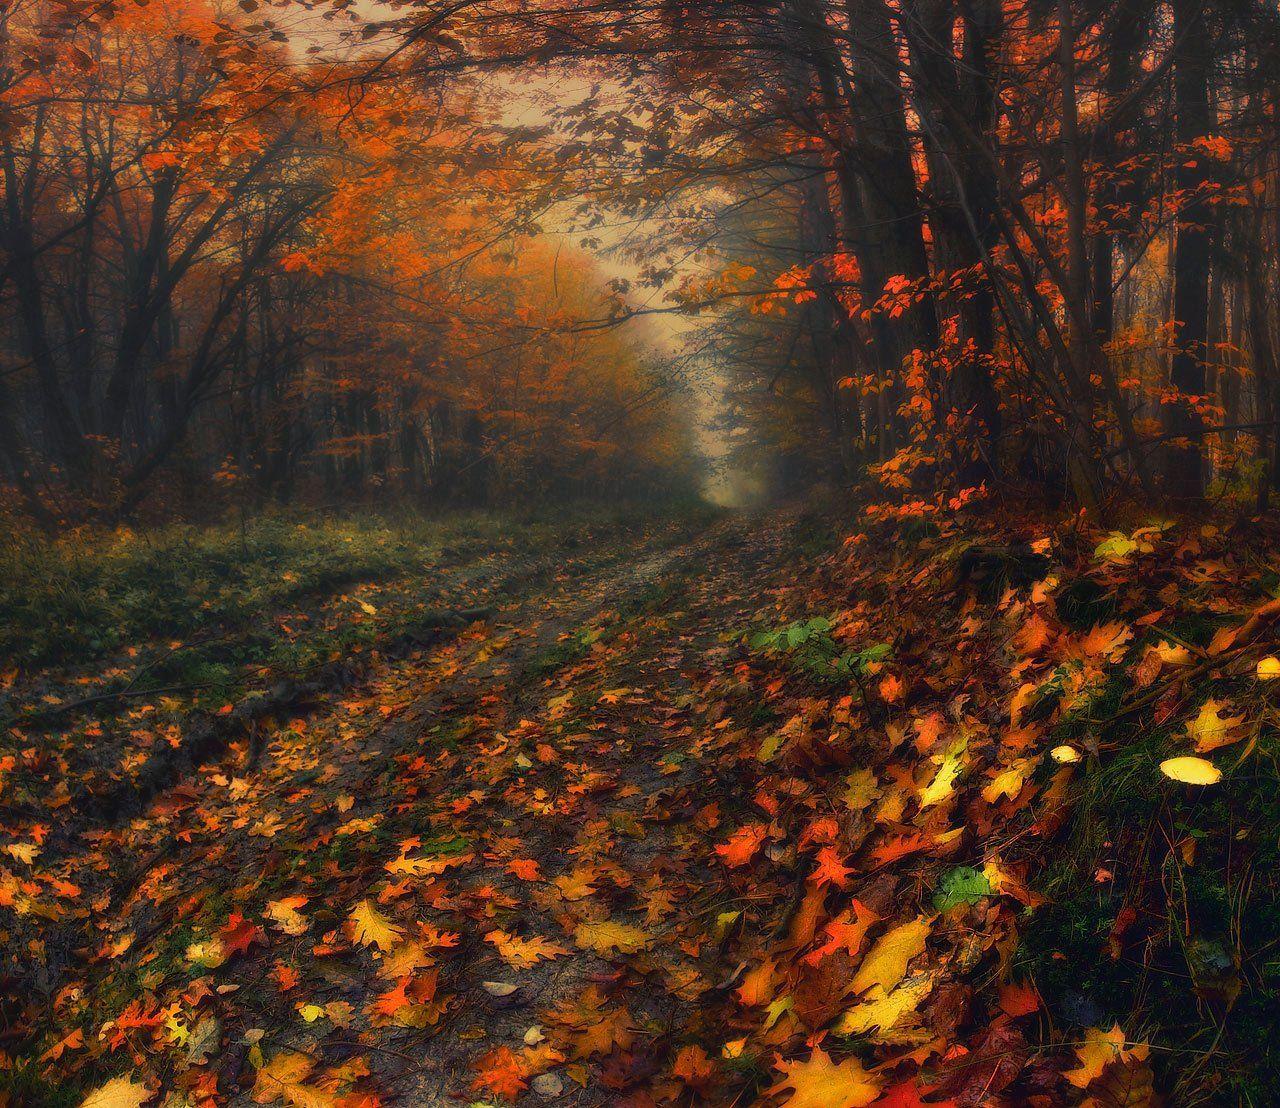 осень, утро, лес, дорога, туман, листопад, Владимир